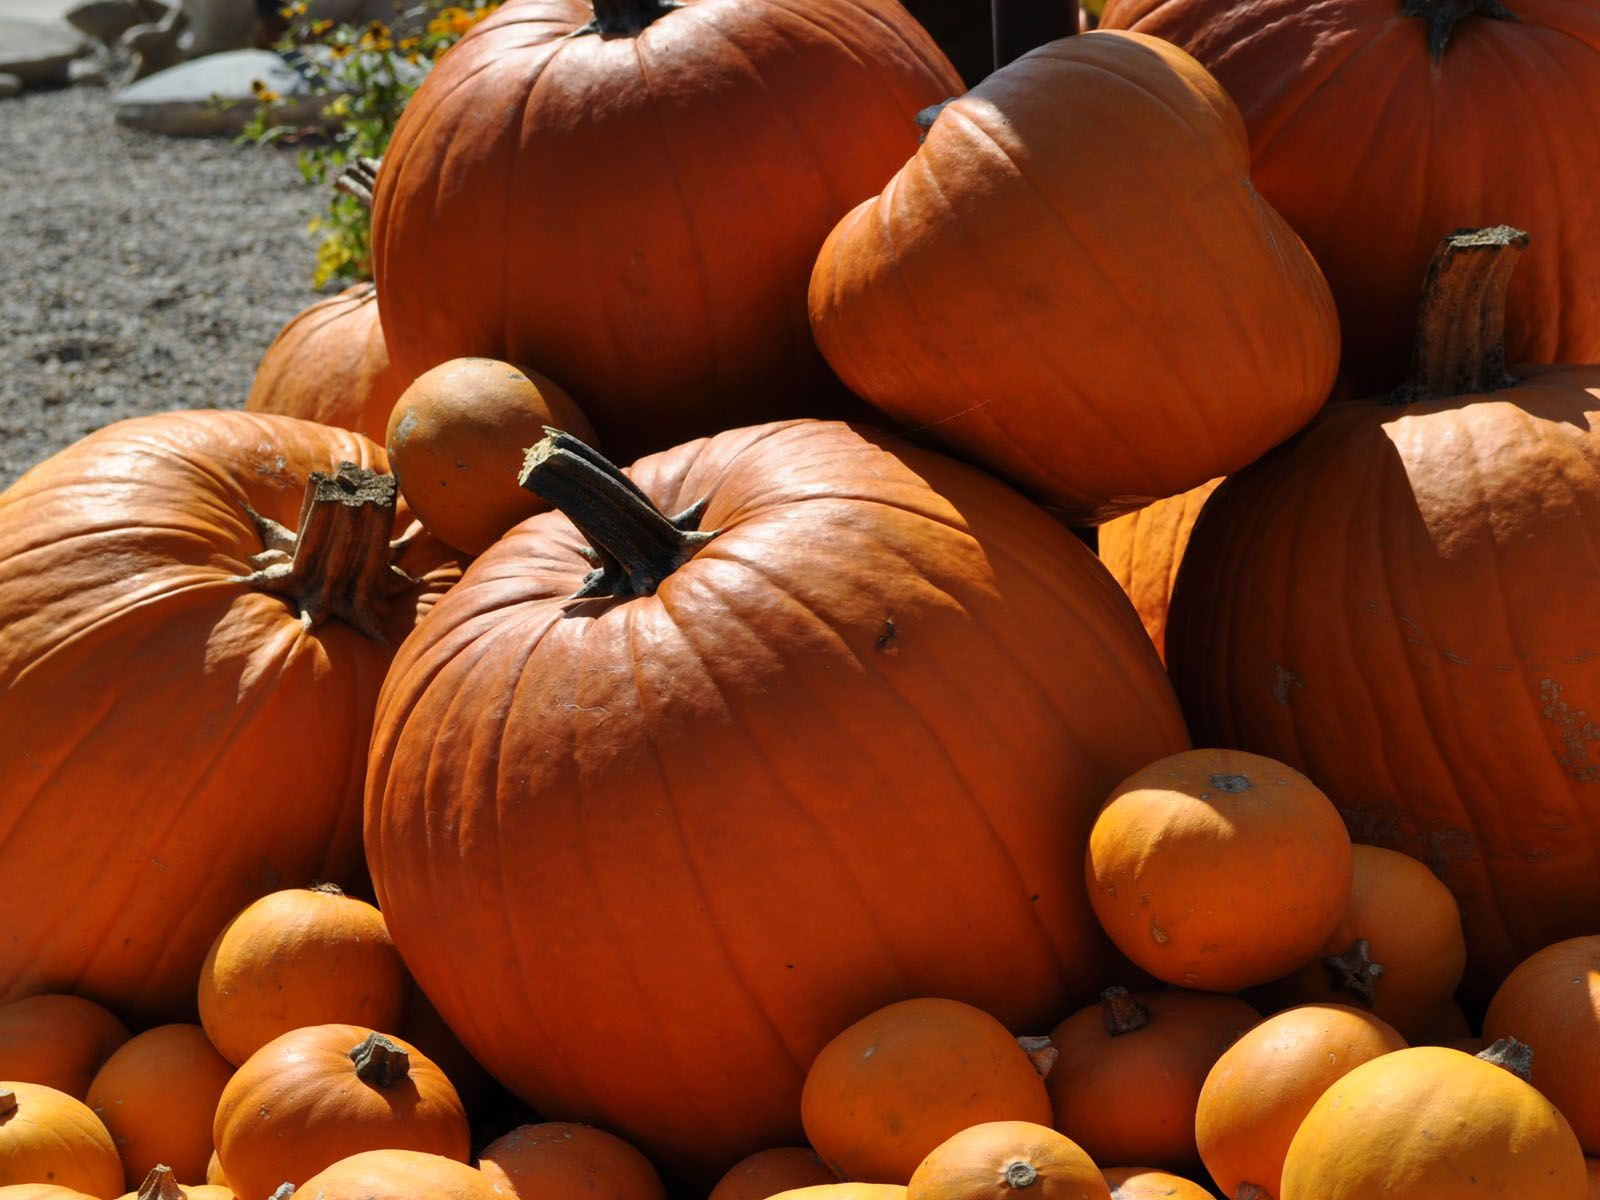 Download Pumpkins Wallpaper and Backgrounds 1600x1200